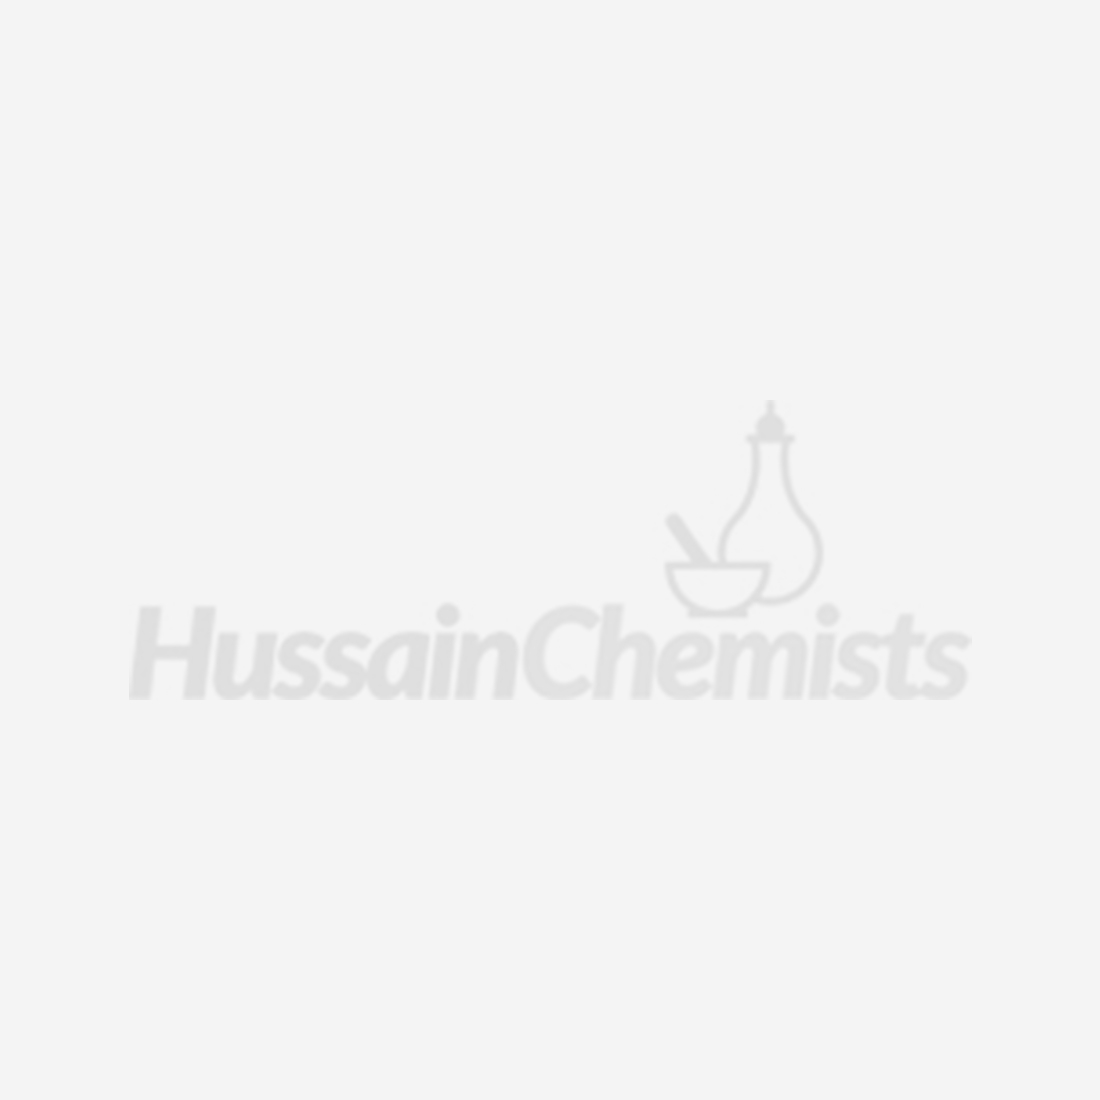 Vaseline Vaseline Intensive Care Aloe Lotion, 400ml, 400ml